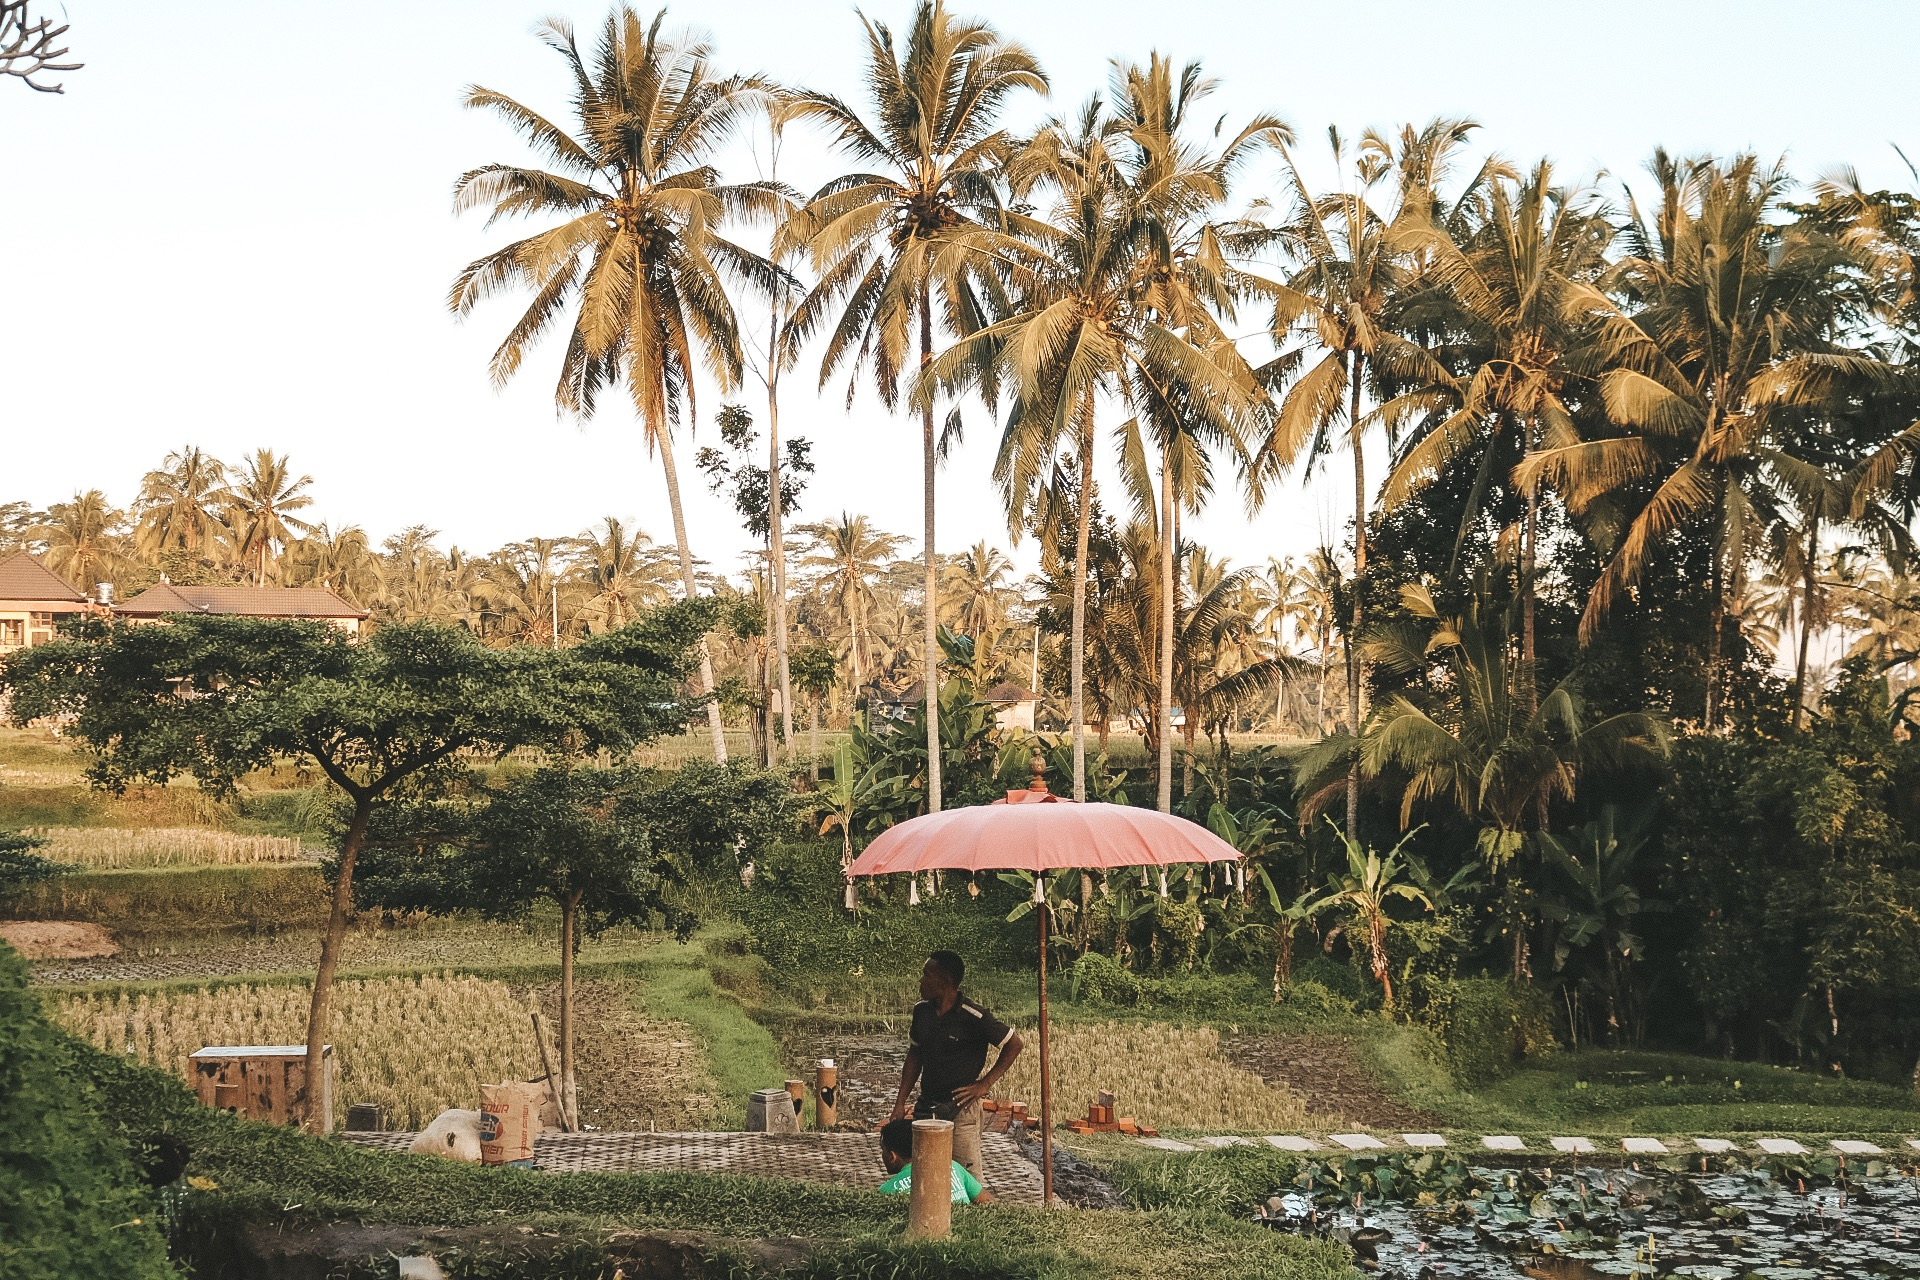 Green Kubu Cafe Bali Ubud travel guide best food best rice terrace views best cheap local eats blog